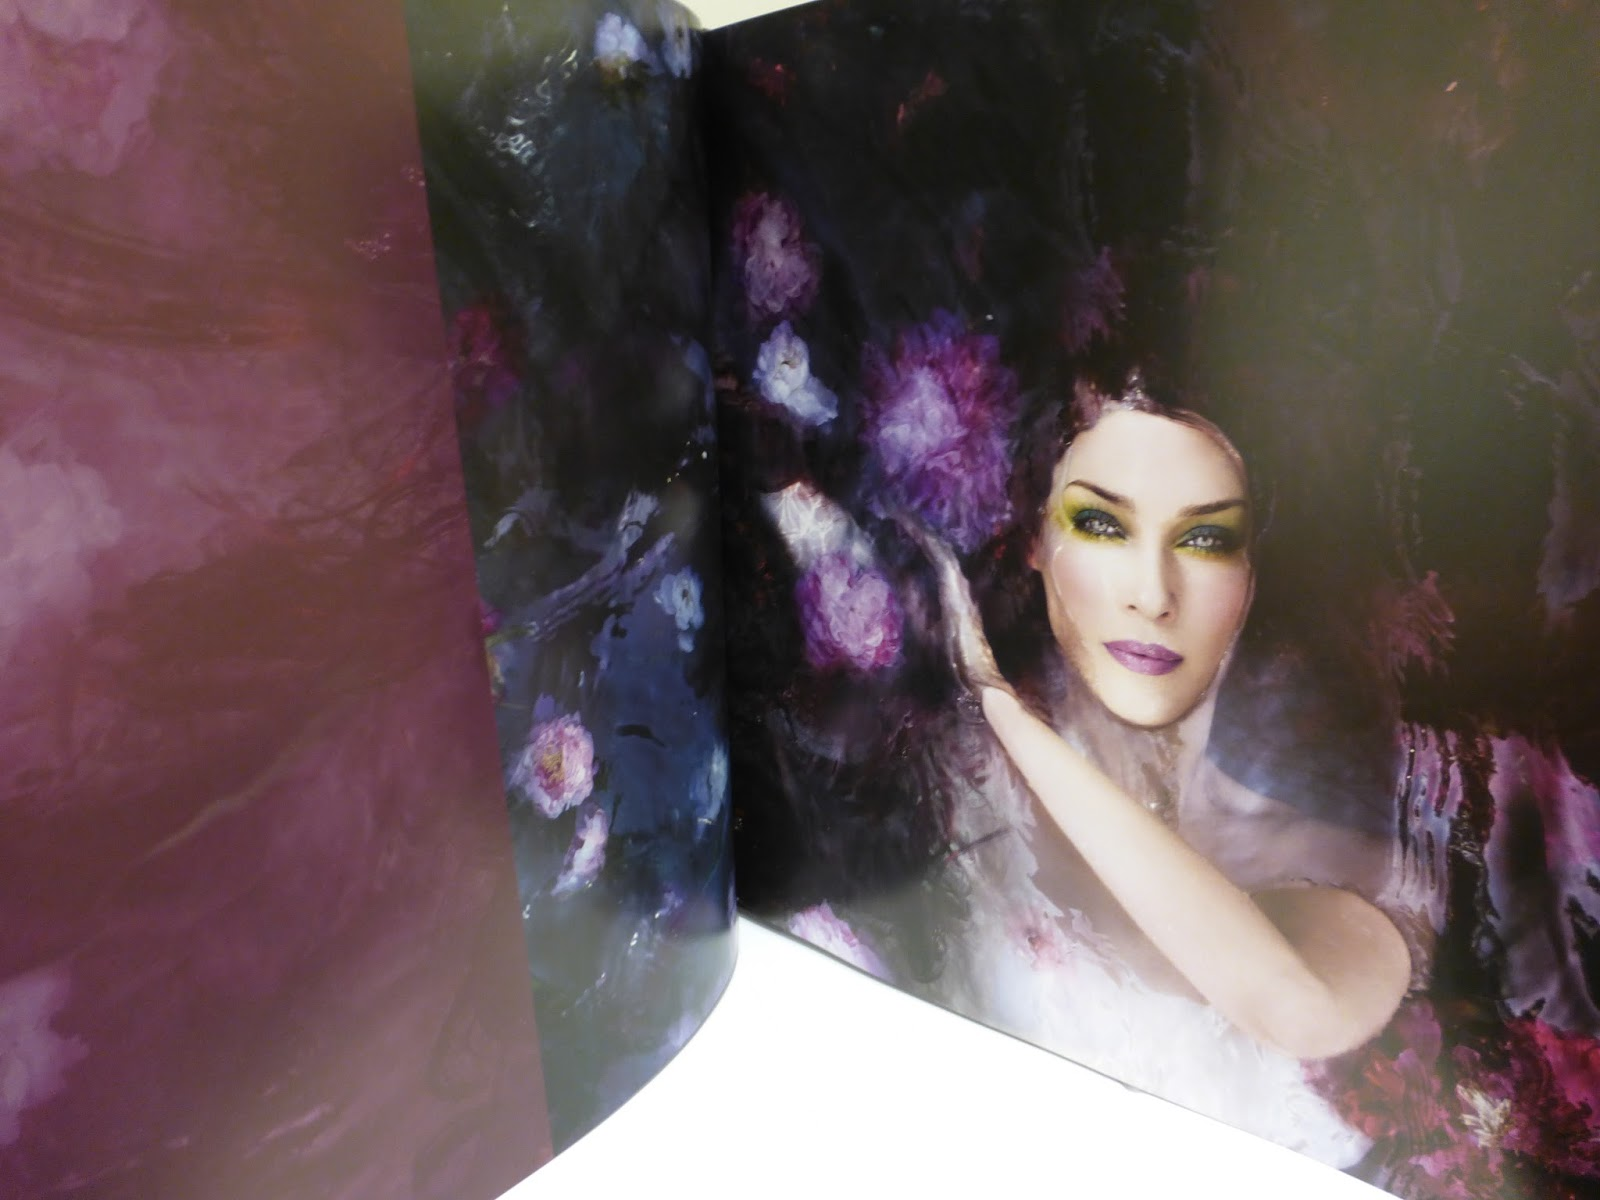 Francesca Tolot - One Woman 100 Faces